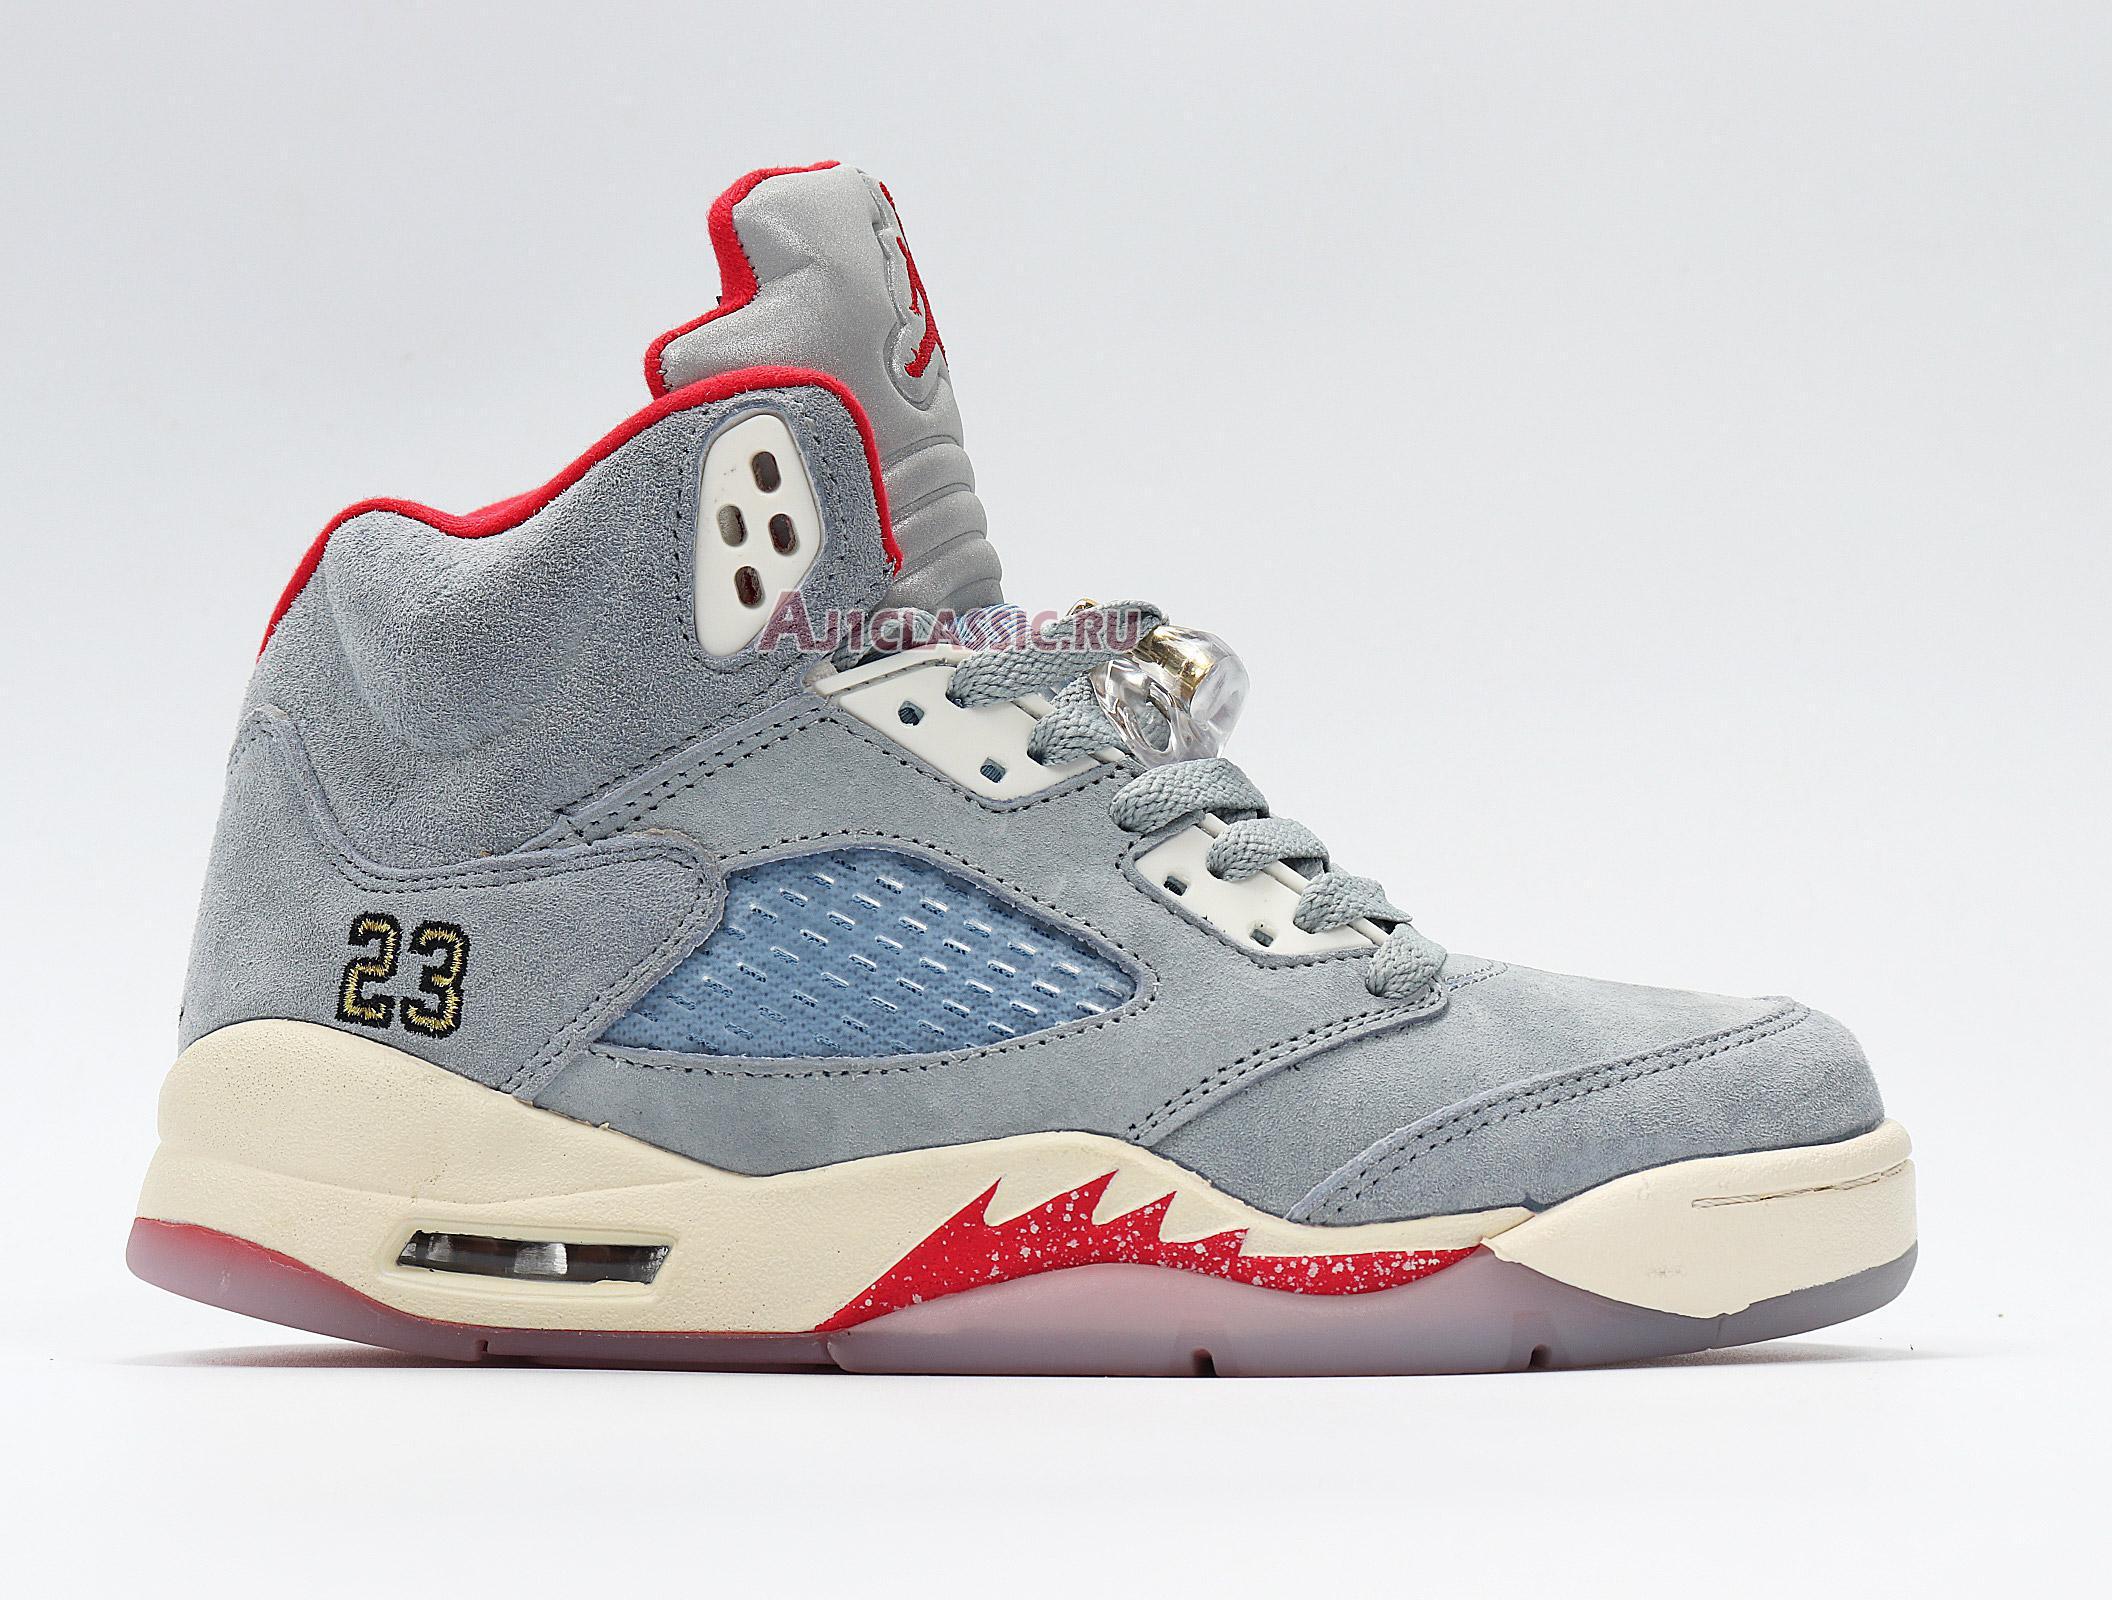 "Trophy Room x Air Jordan 5 Retro ""Ice Blue"" CI1899-400"